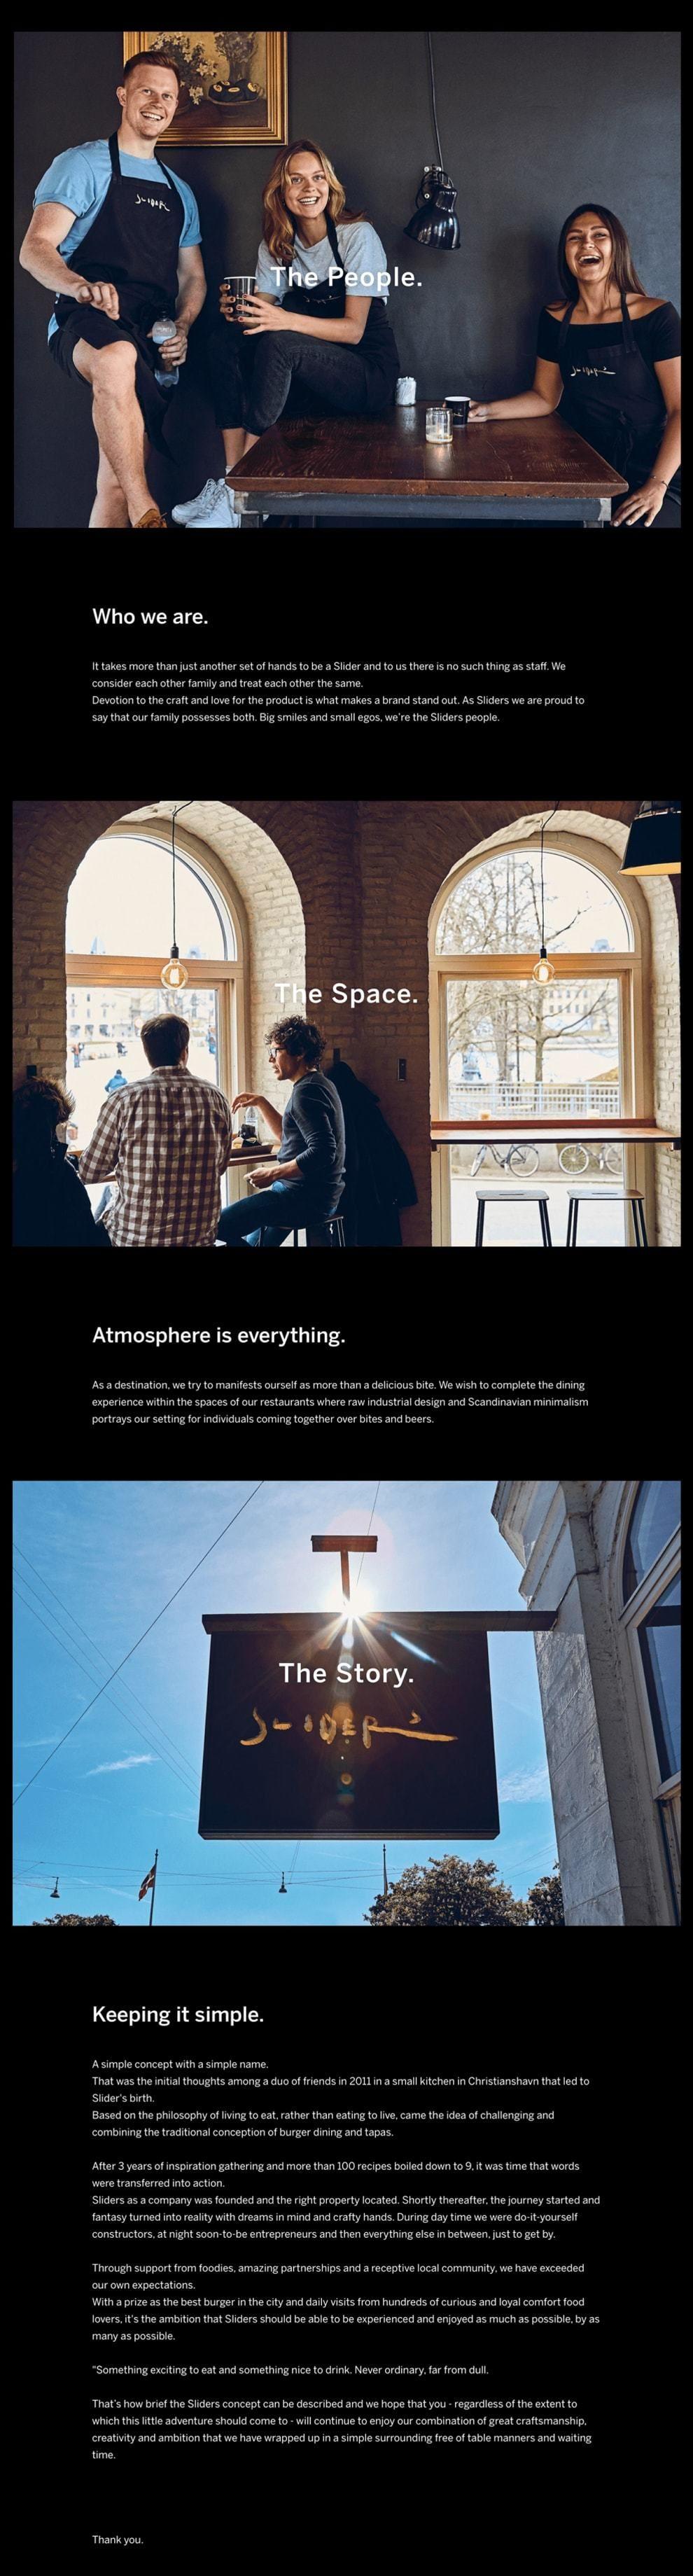 Sliders Elegant Website Design